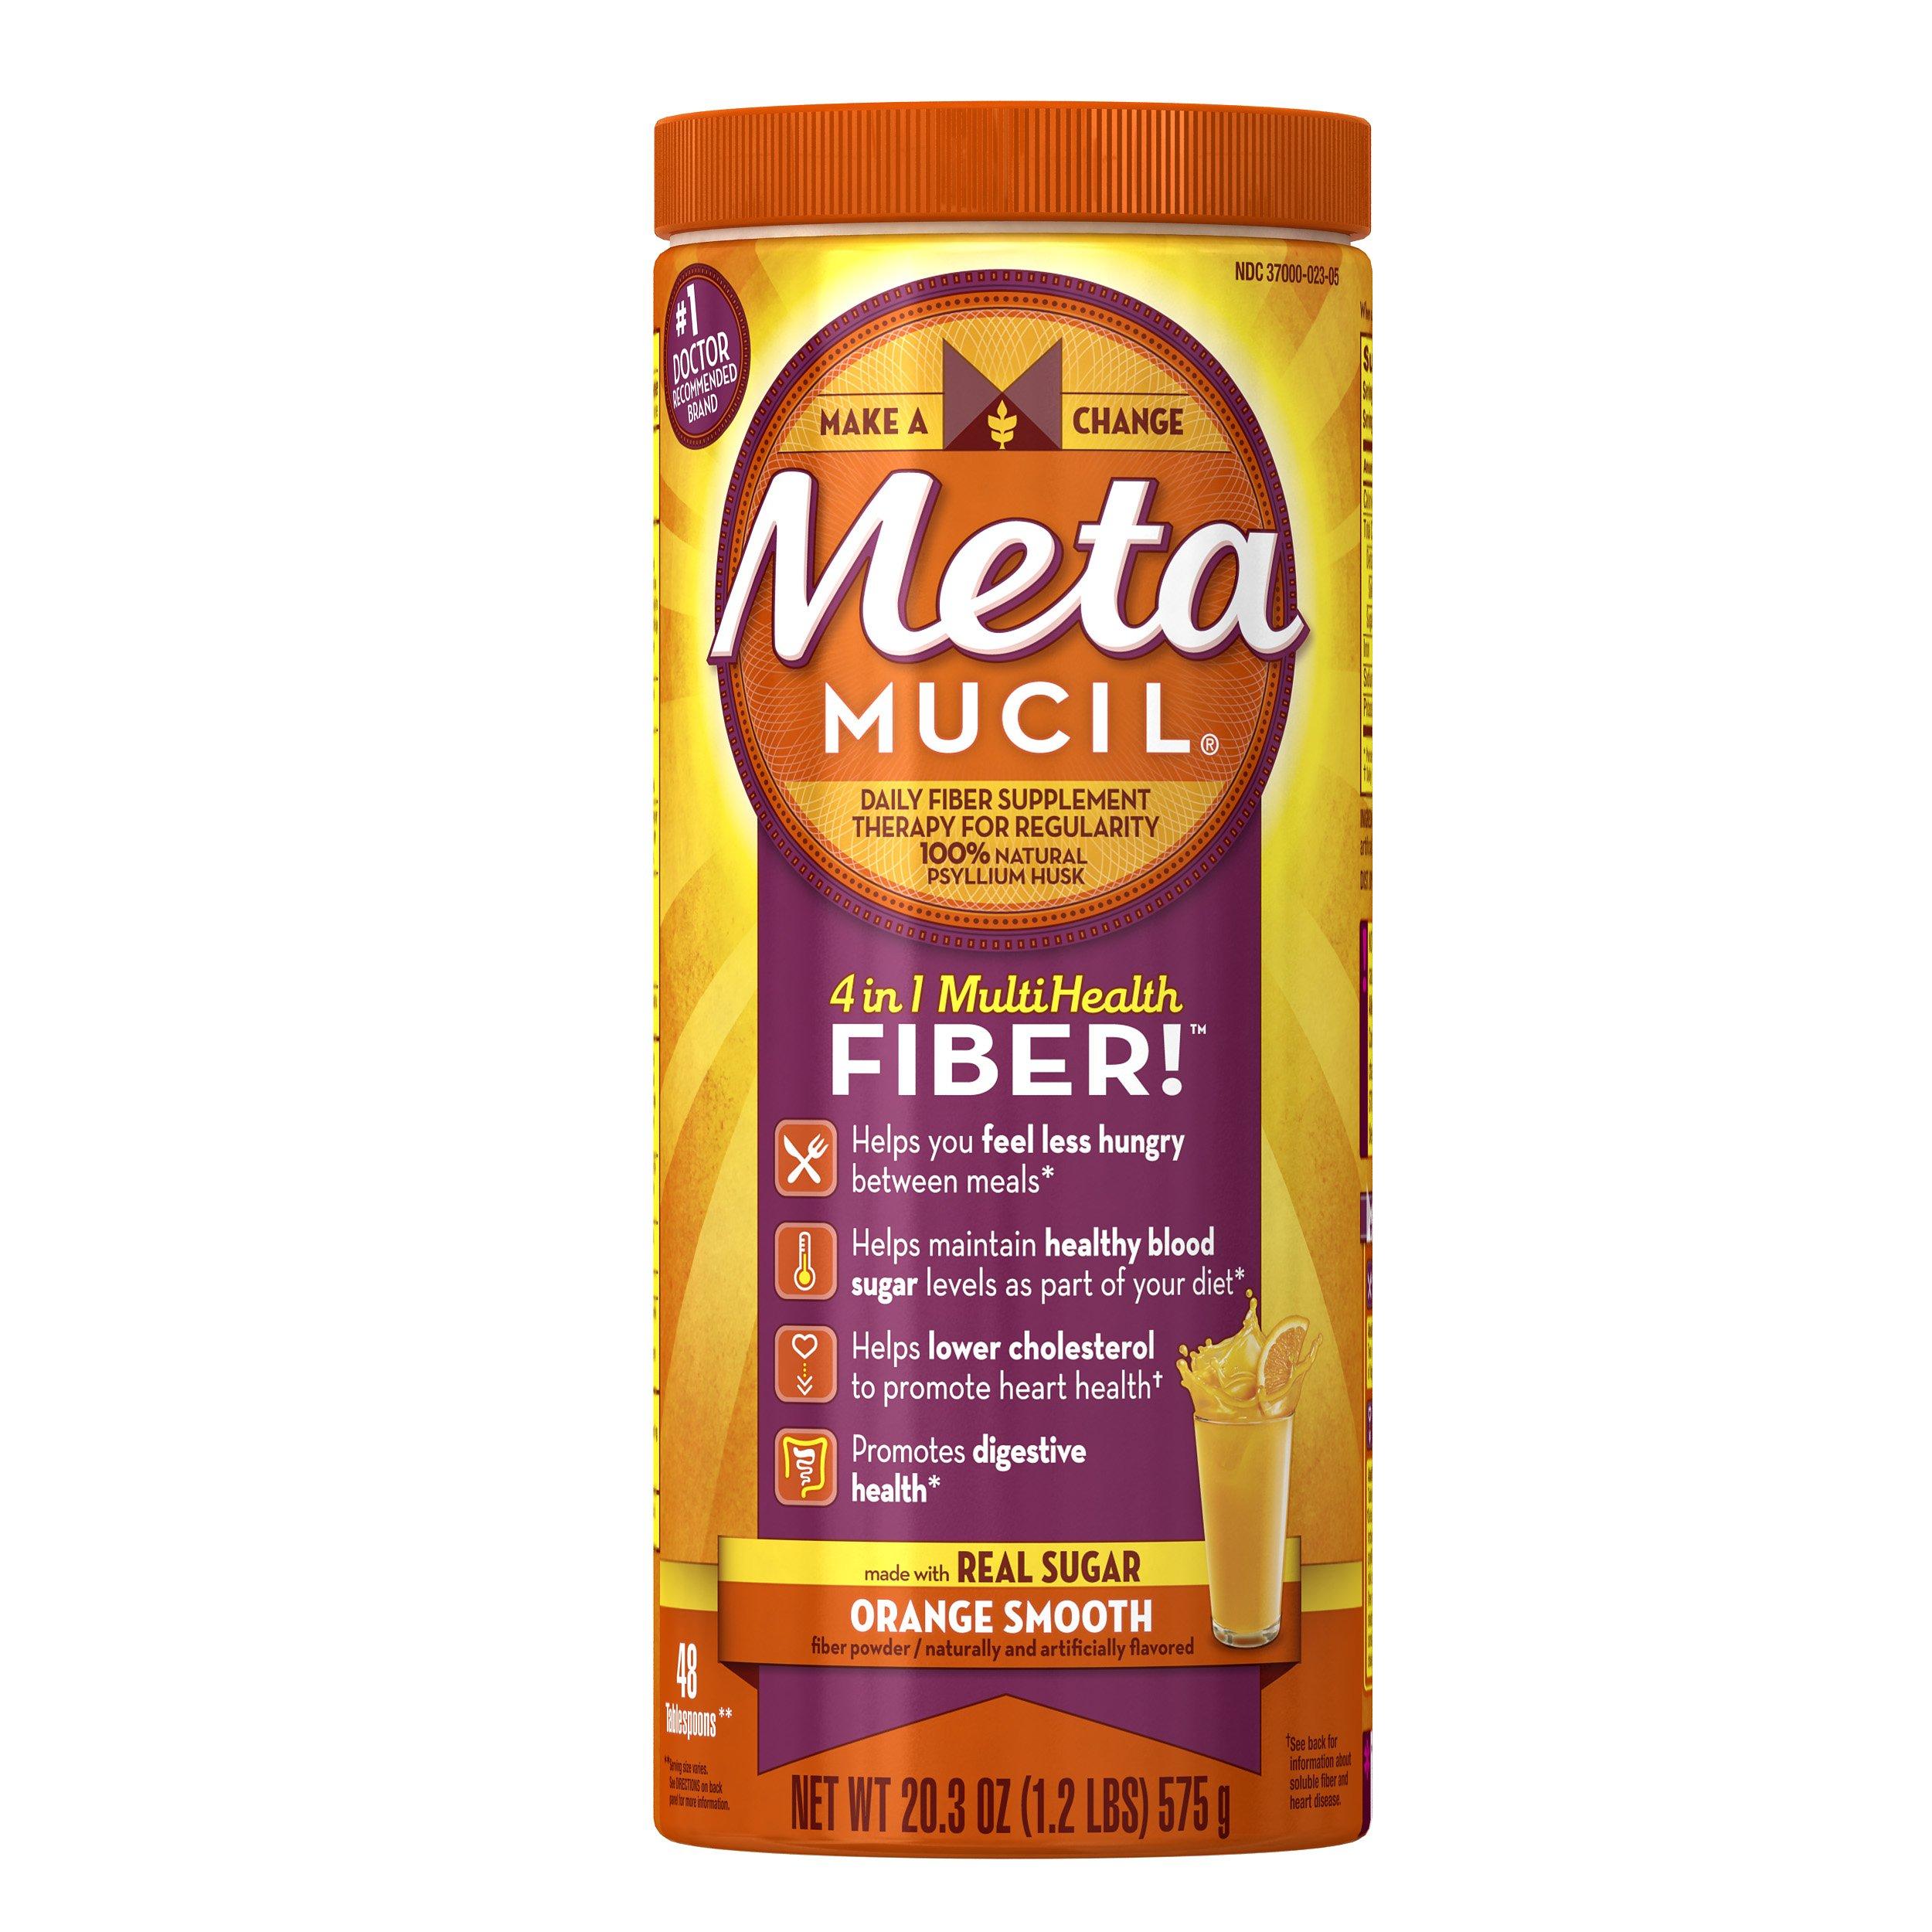 Metamucil Daily Fiber Powder Supplement, 100% Natural Psyllium Husk, Orange Smooth Sugar Fiber Powder, 48 Dose, 20.3 Ounce